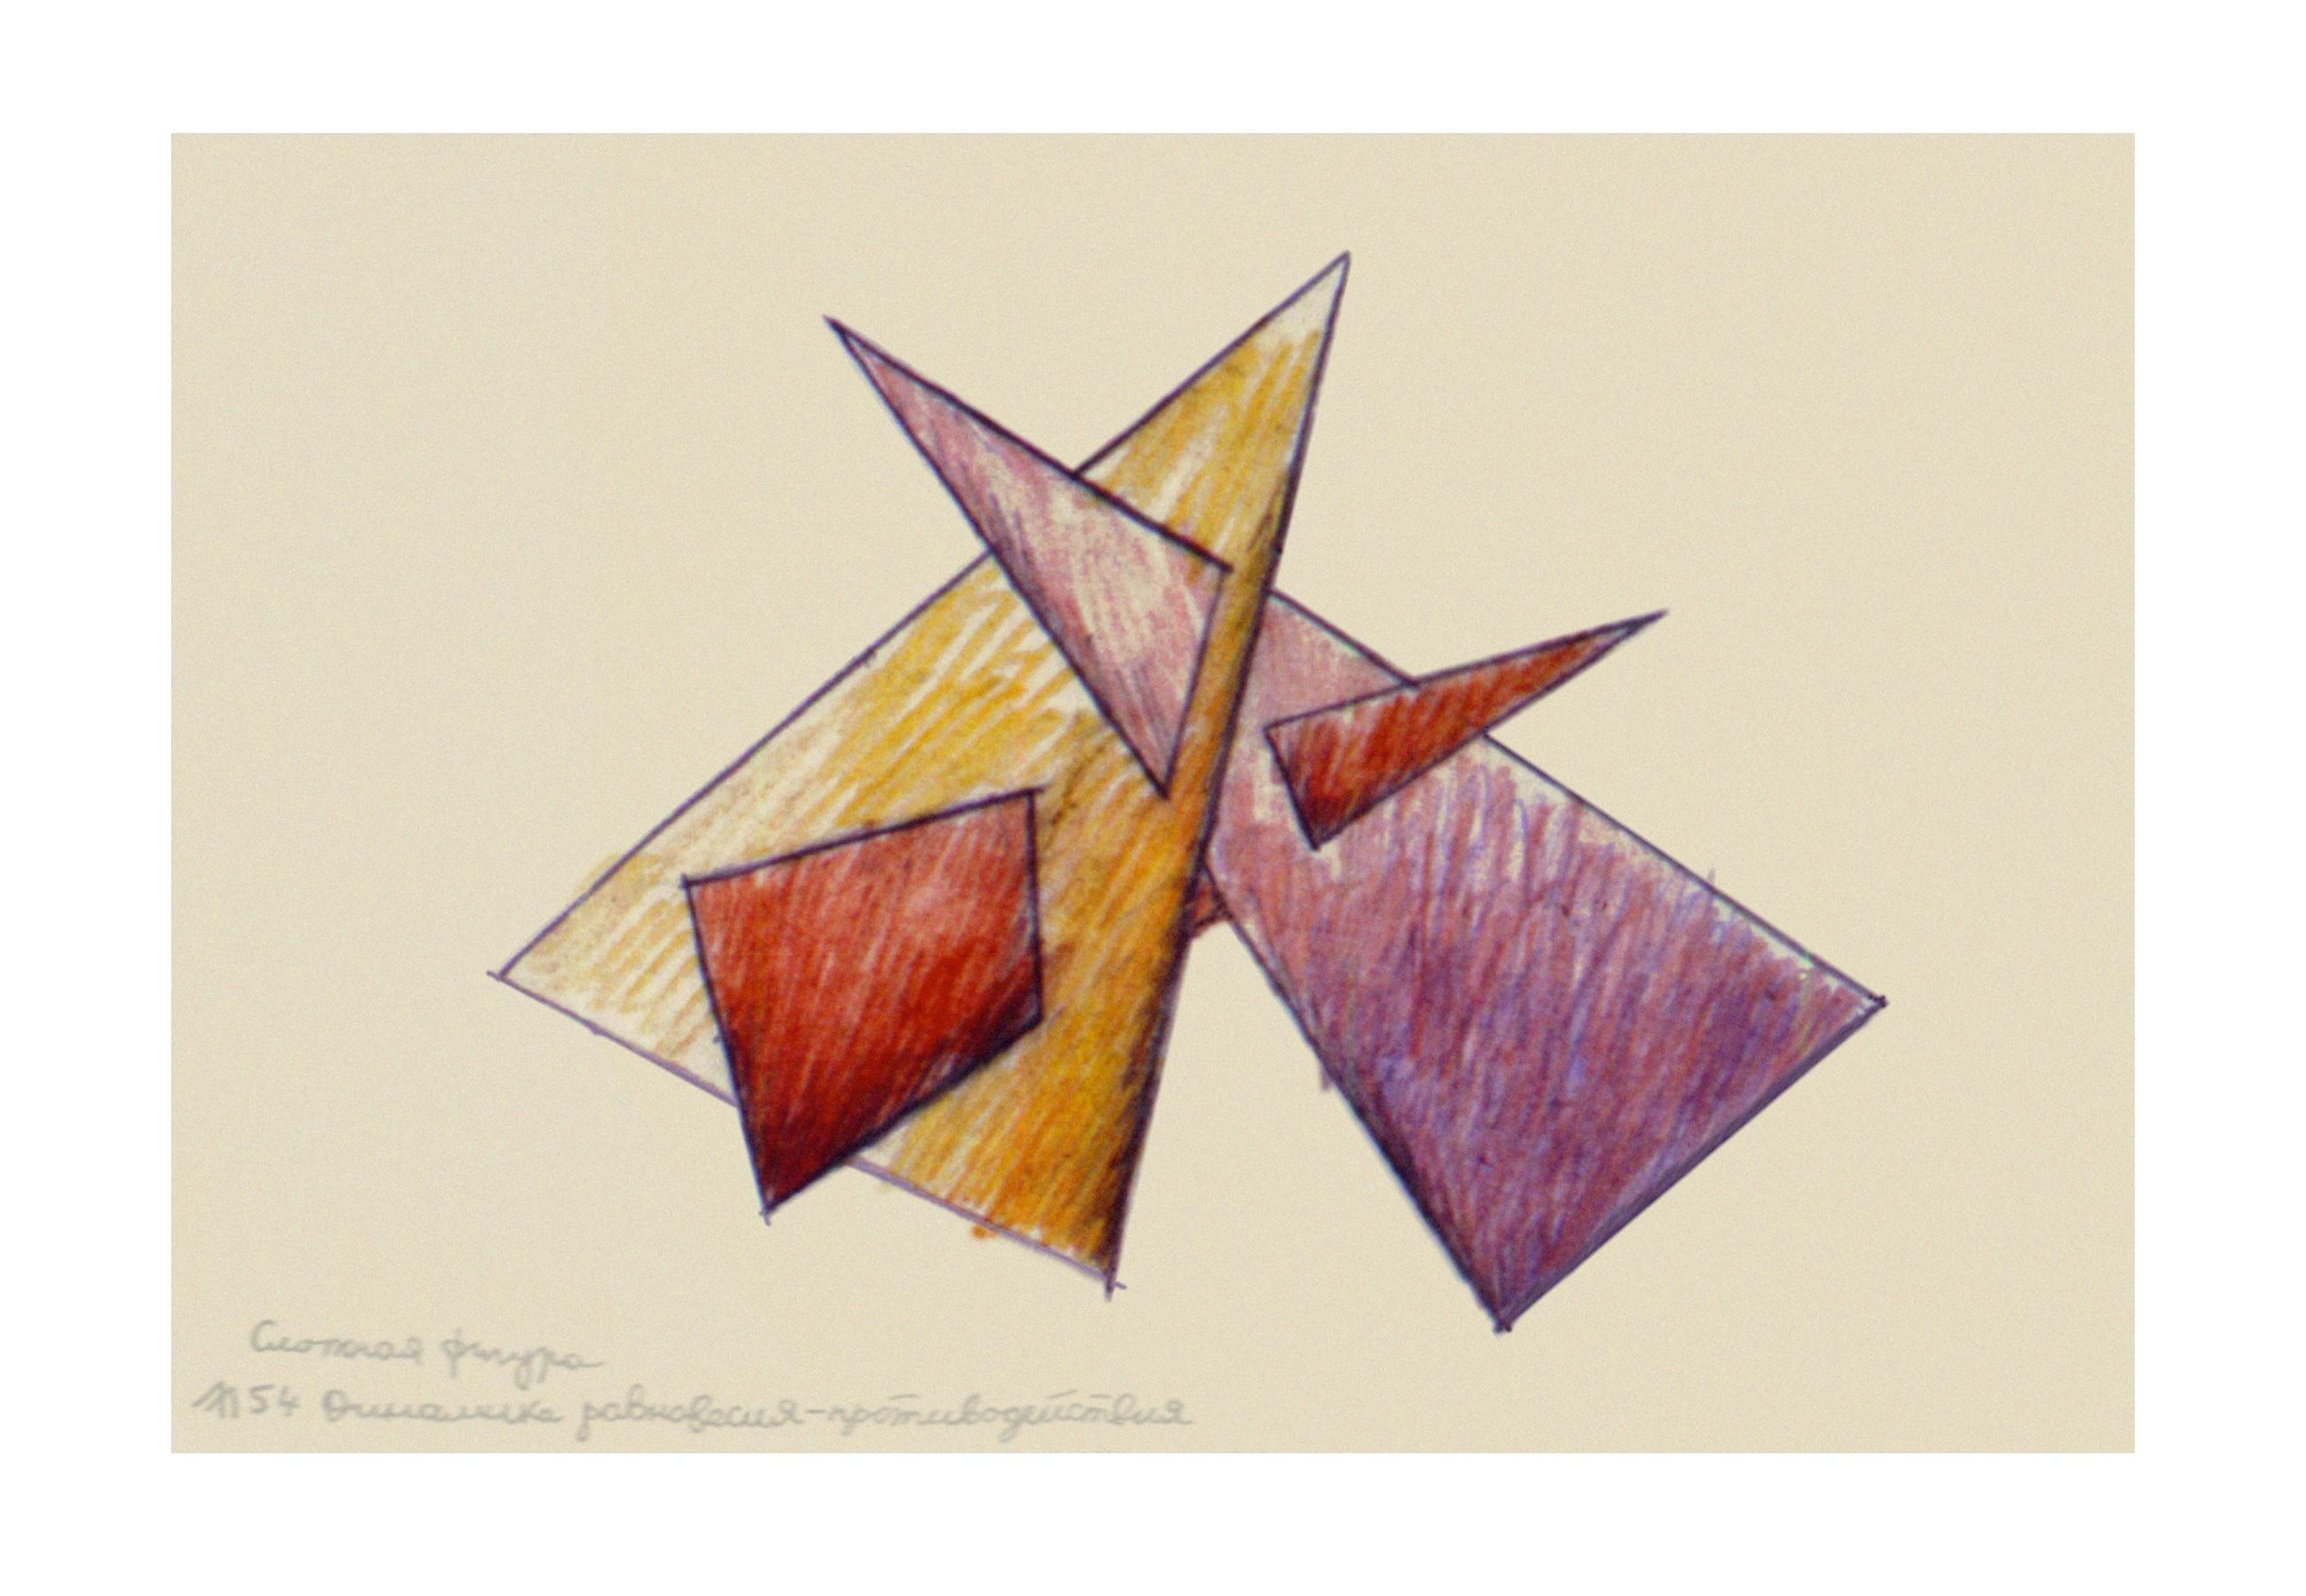 Lamm-Portfolio-1954-1955-03.jpg